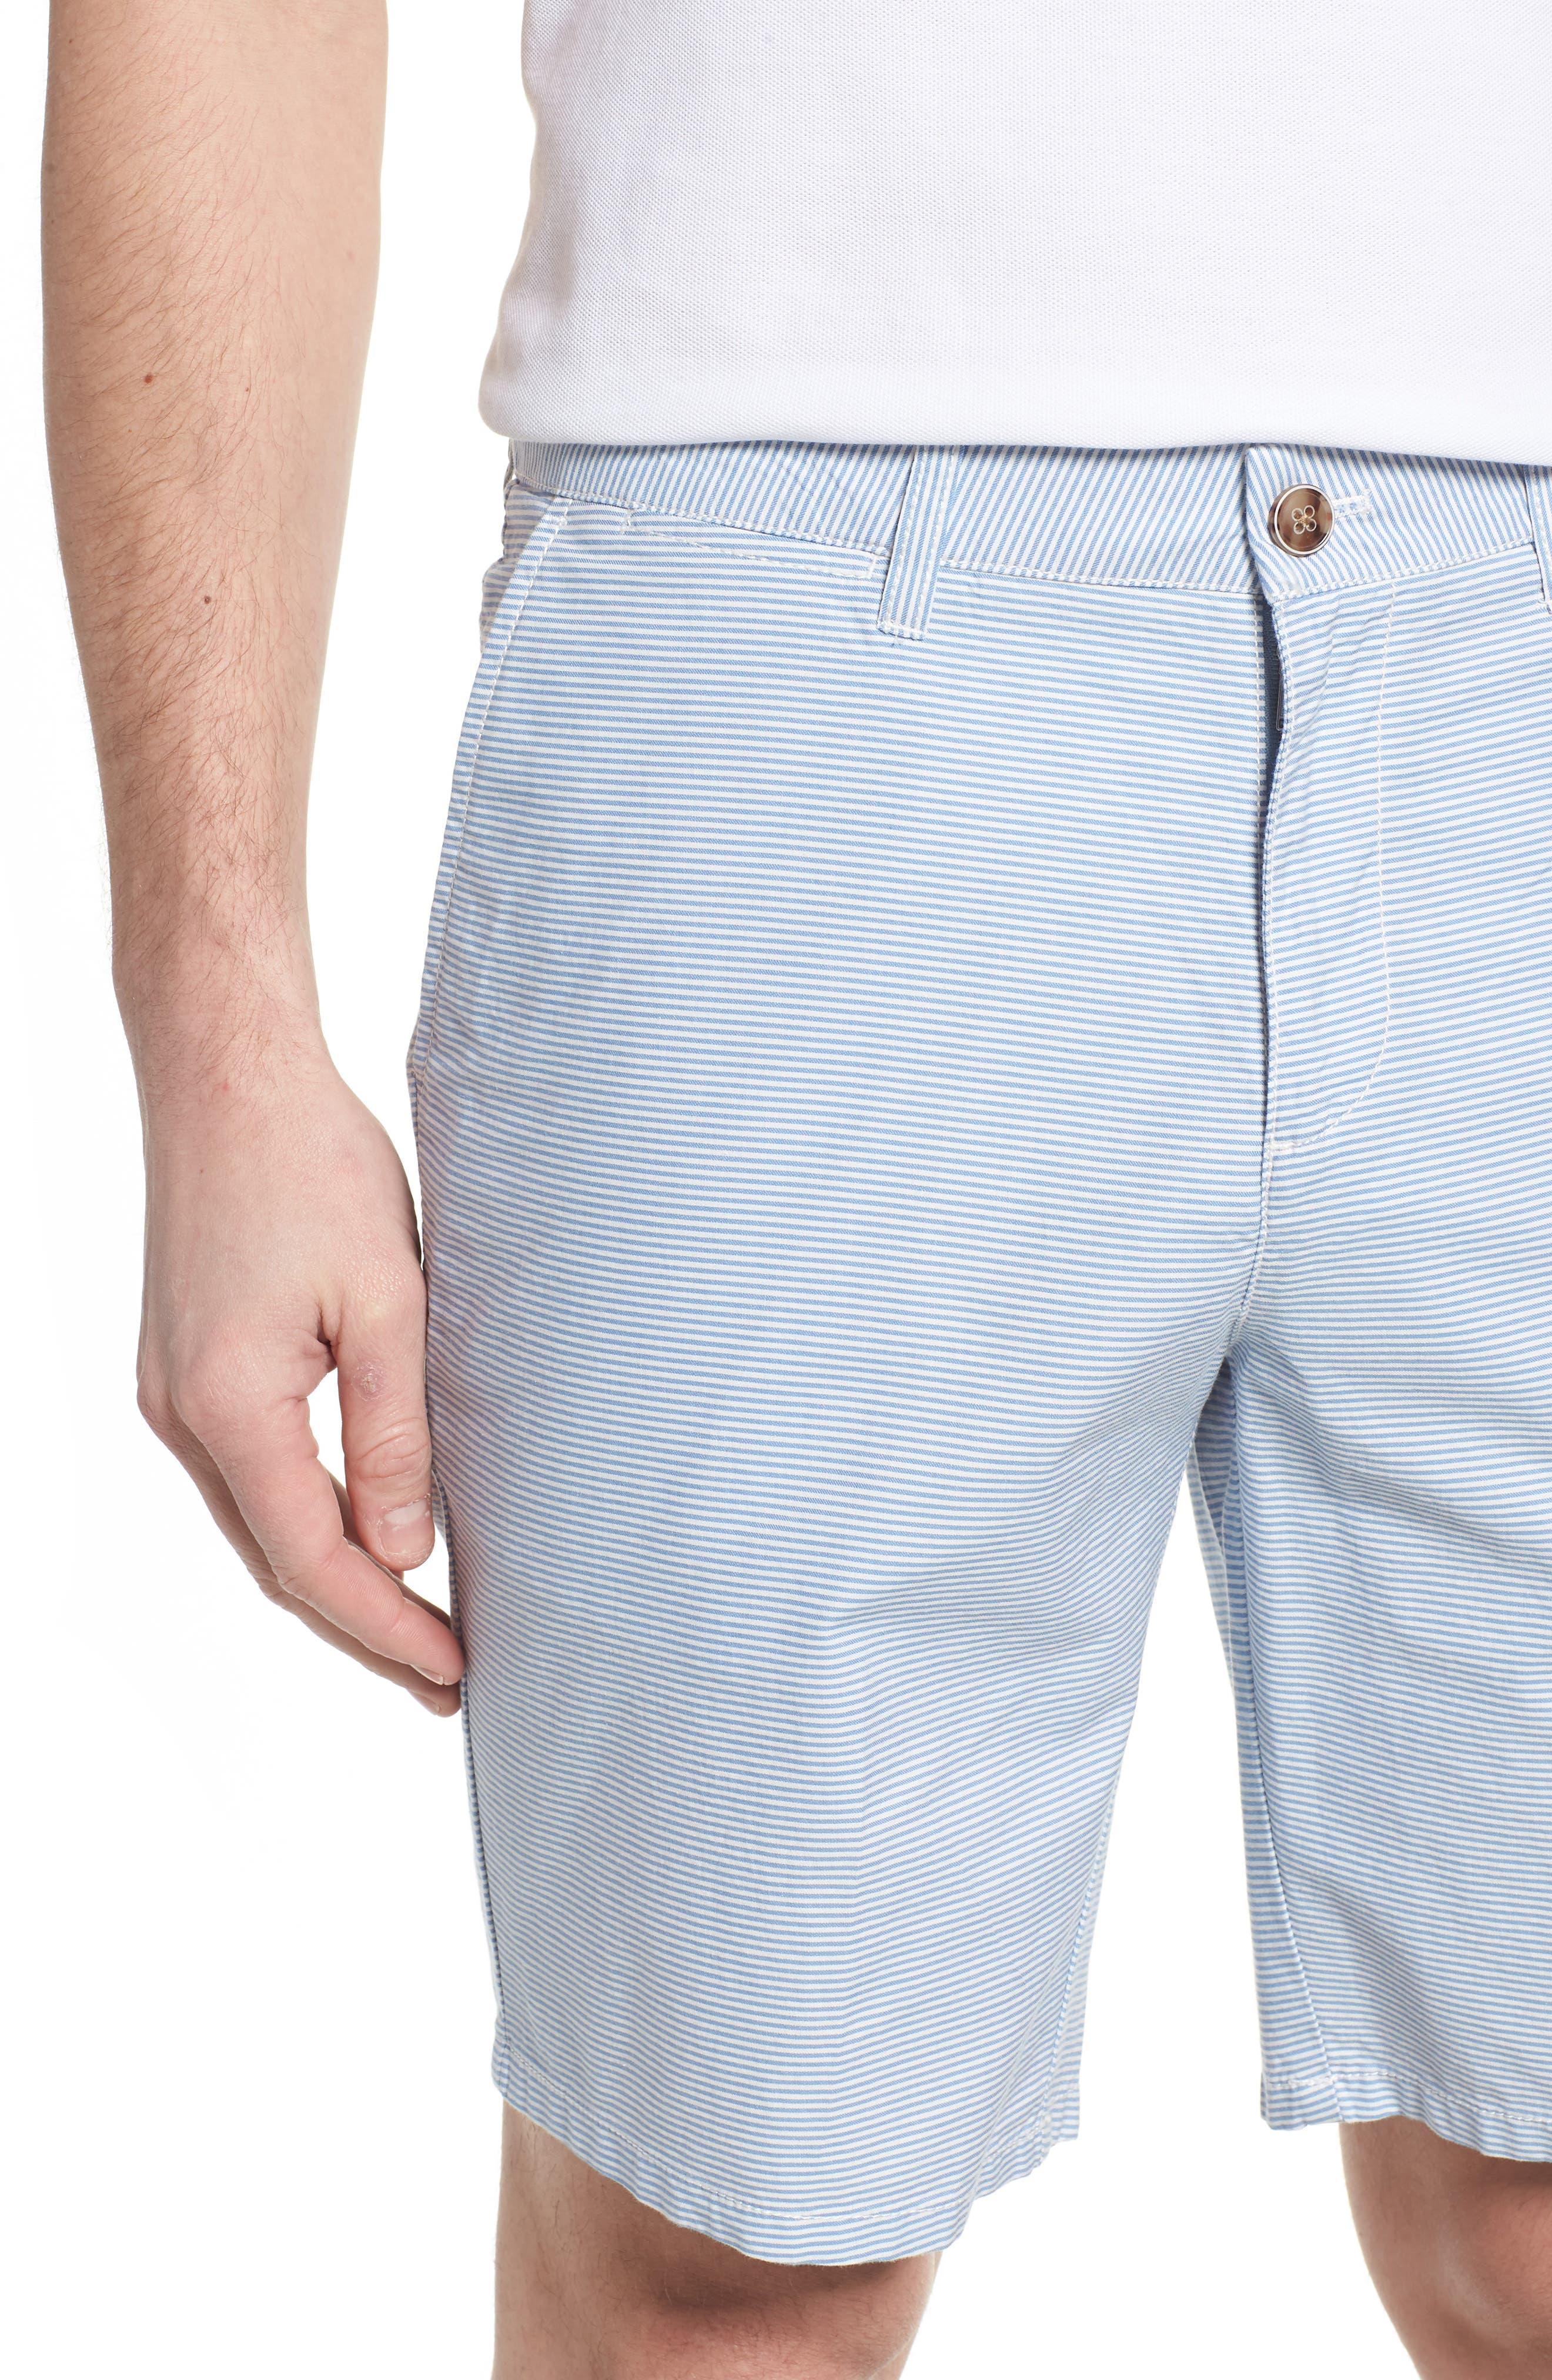 Geordy Regular Fit Pinstripe Shorts,                             Alternate thumbnail 4, color,                             400